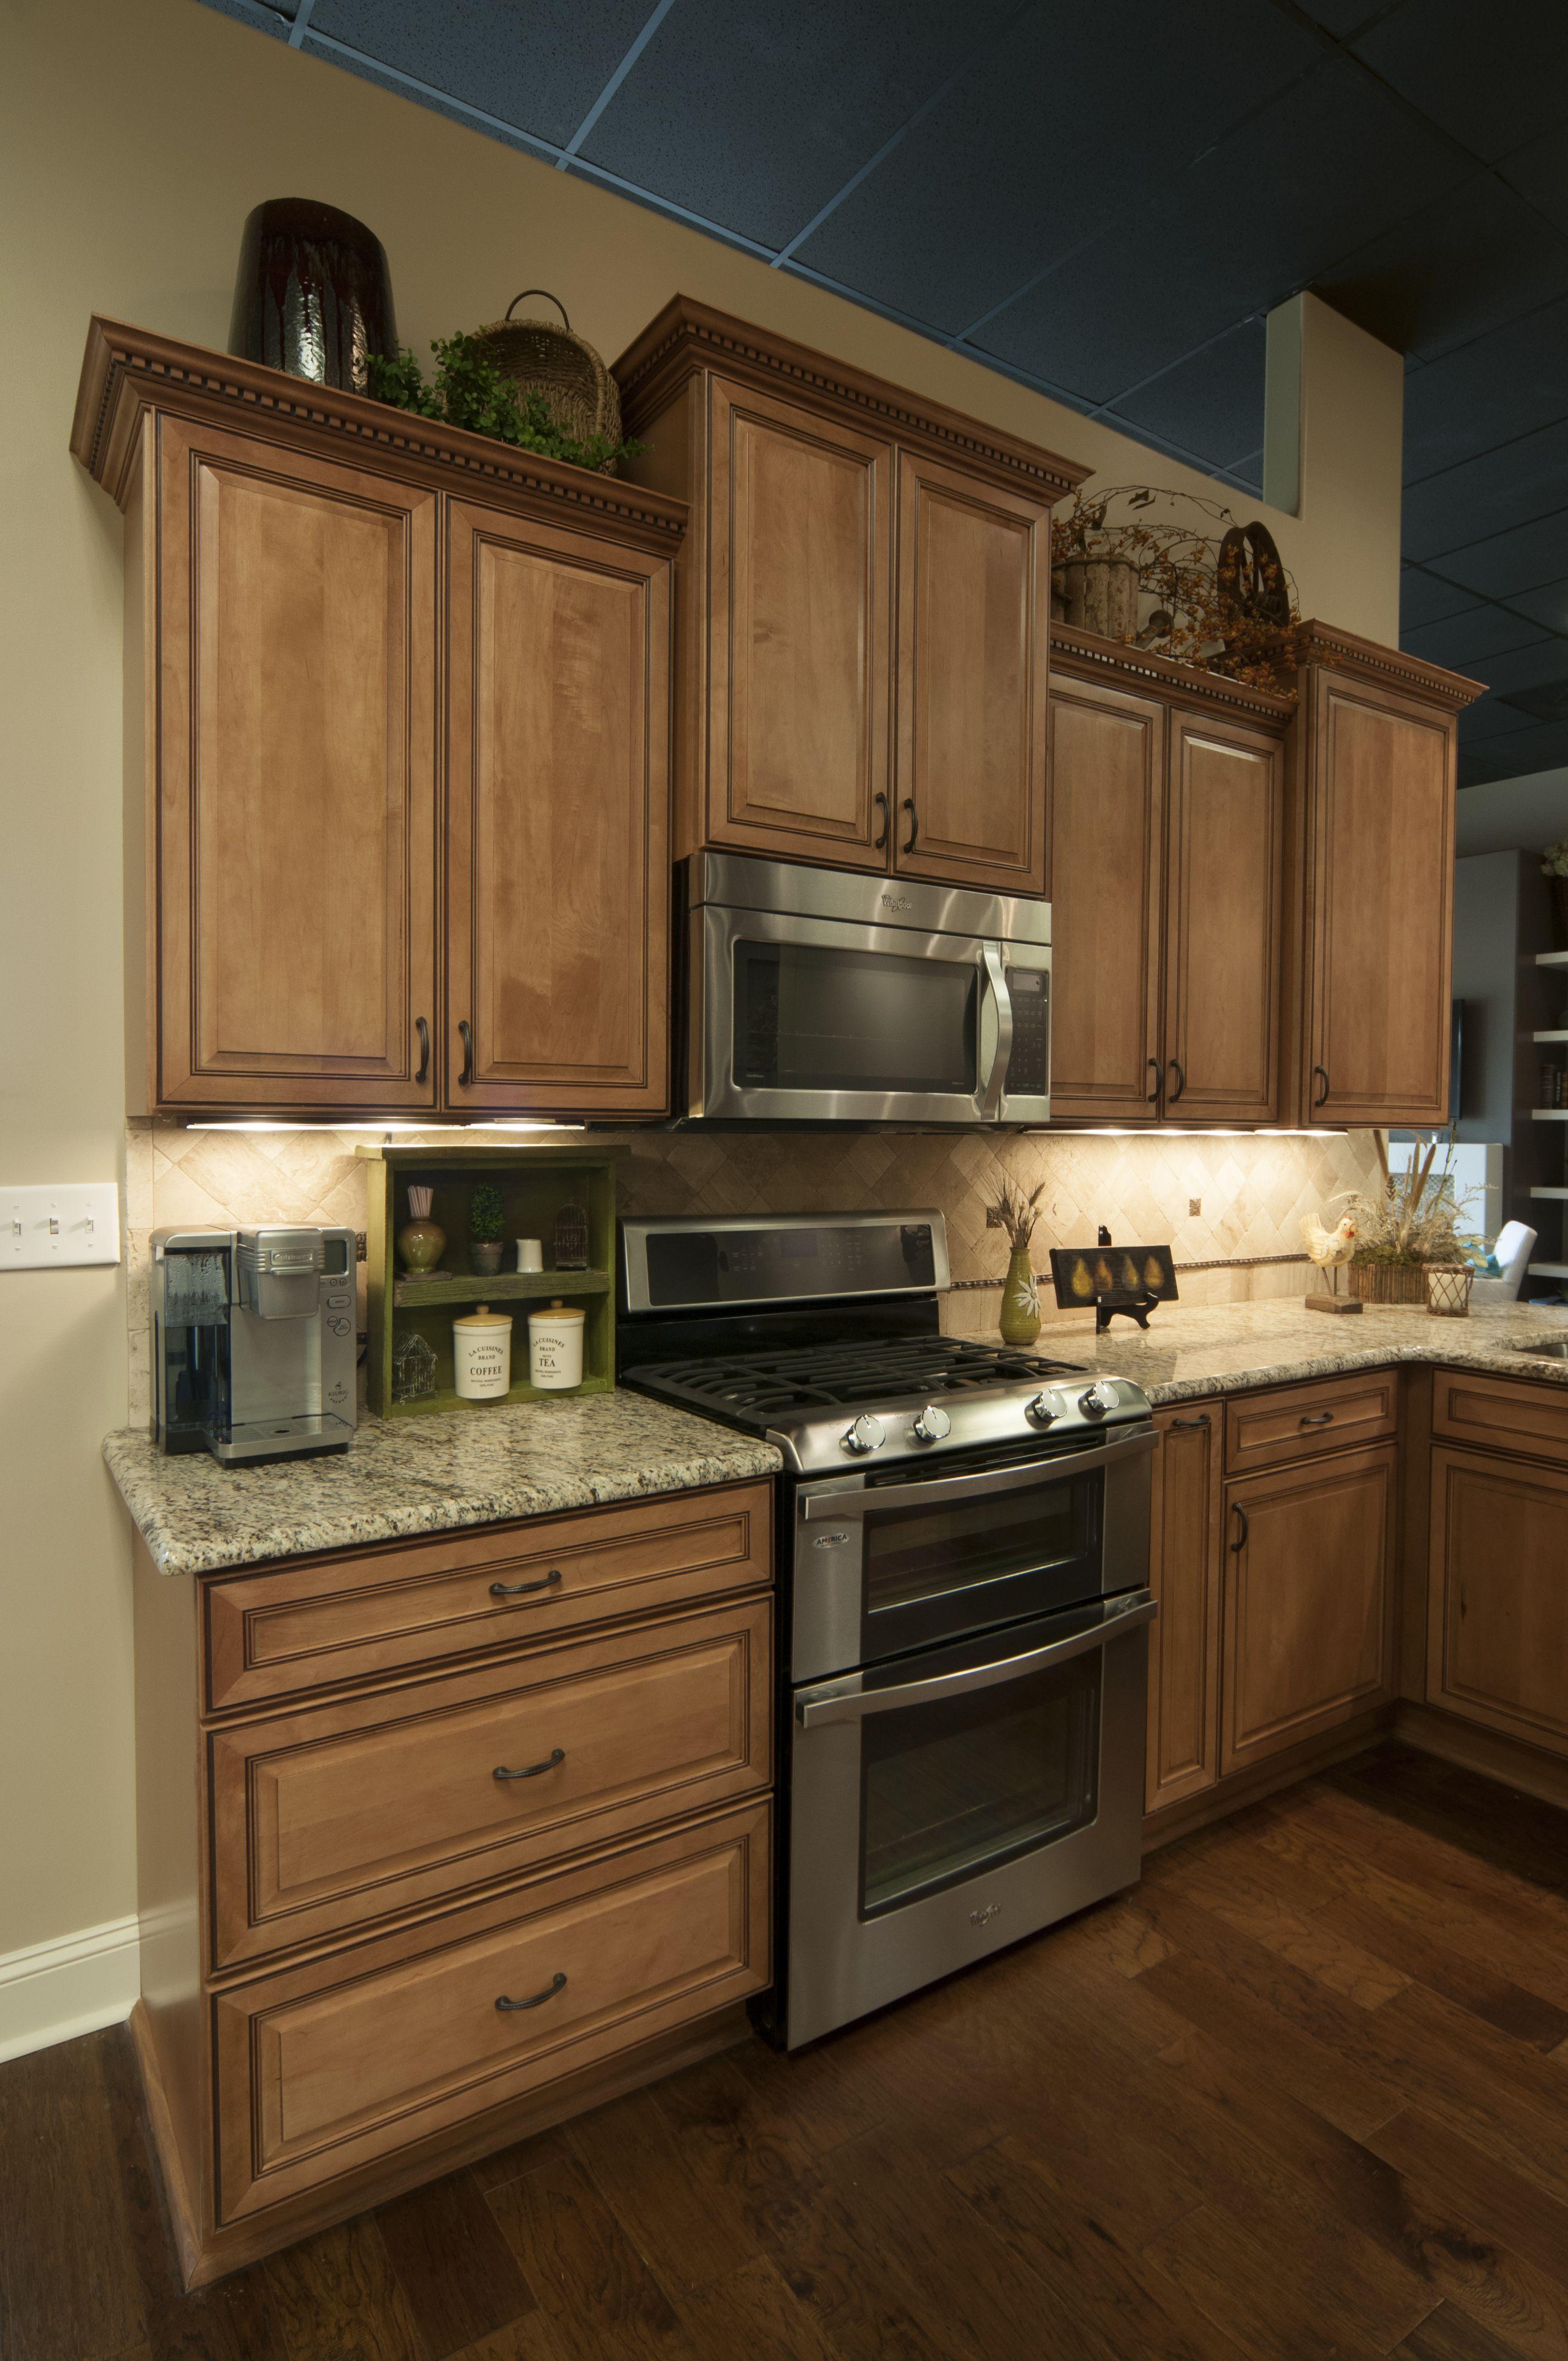 Regency Homebuilders New Homes In Memphis Tn Kitchen Cabinets Buy Kitchen Cabinets Best Kitchen Cabinets